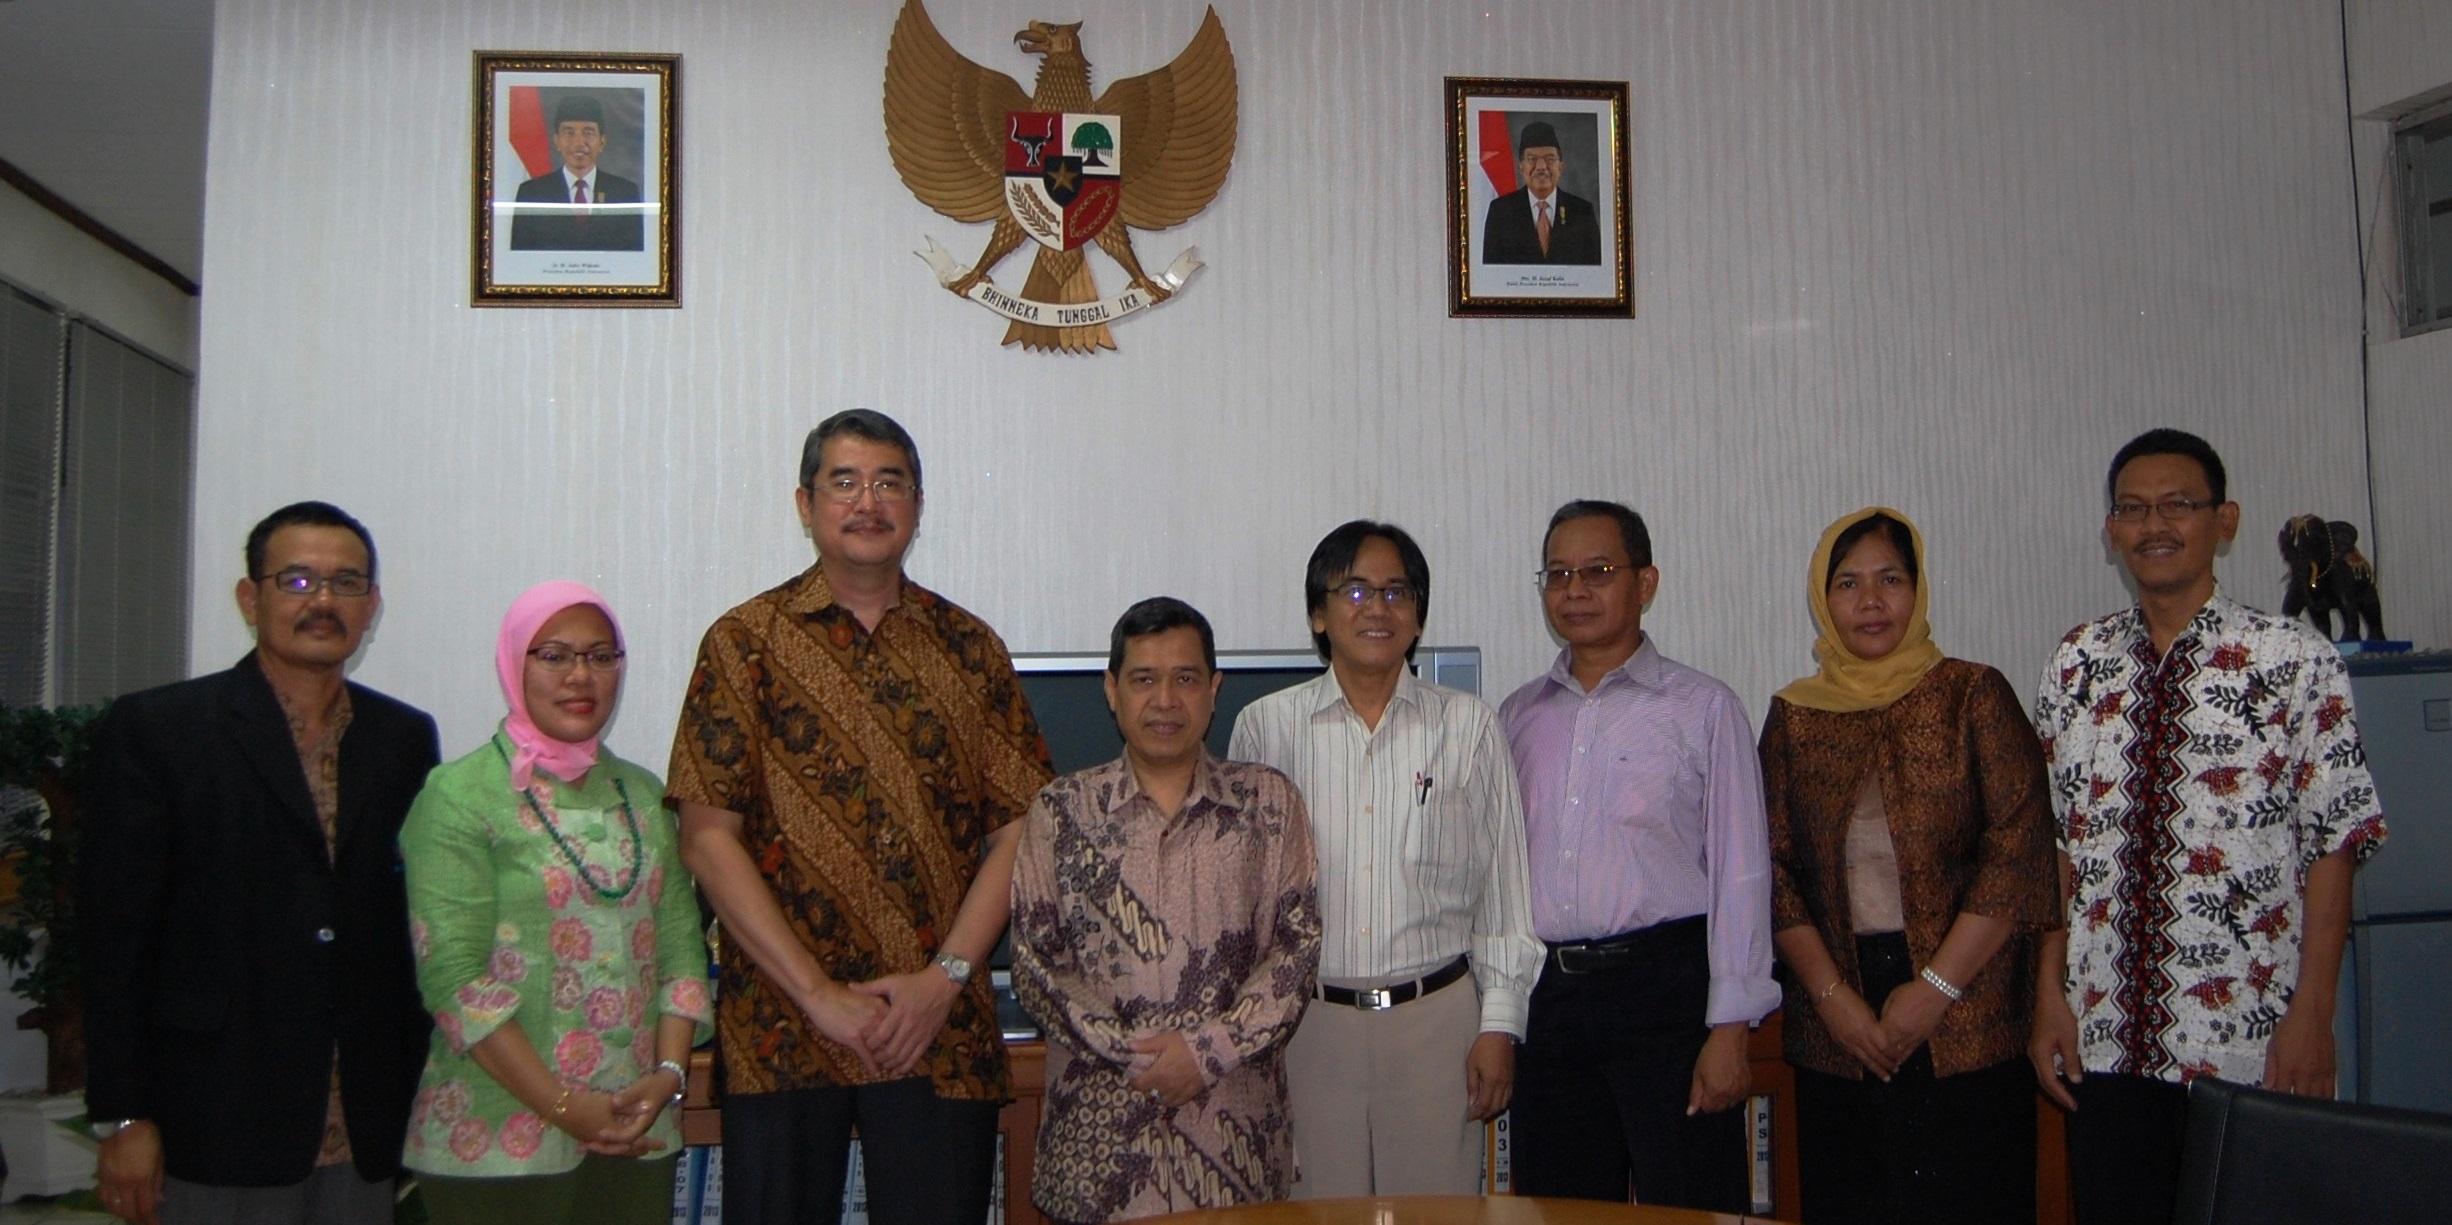 Penandatangan Kerjasama Universitas Esa Unggul dengan Politeknik Negeri Jakarta